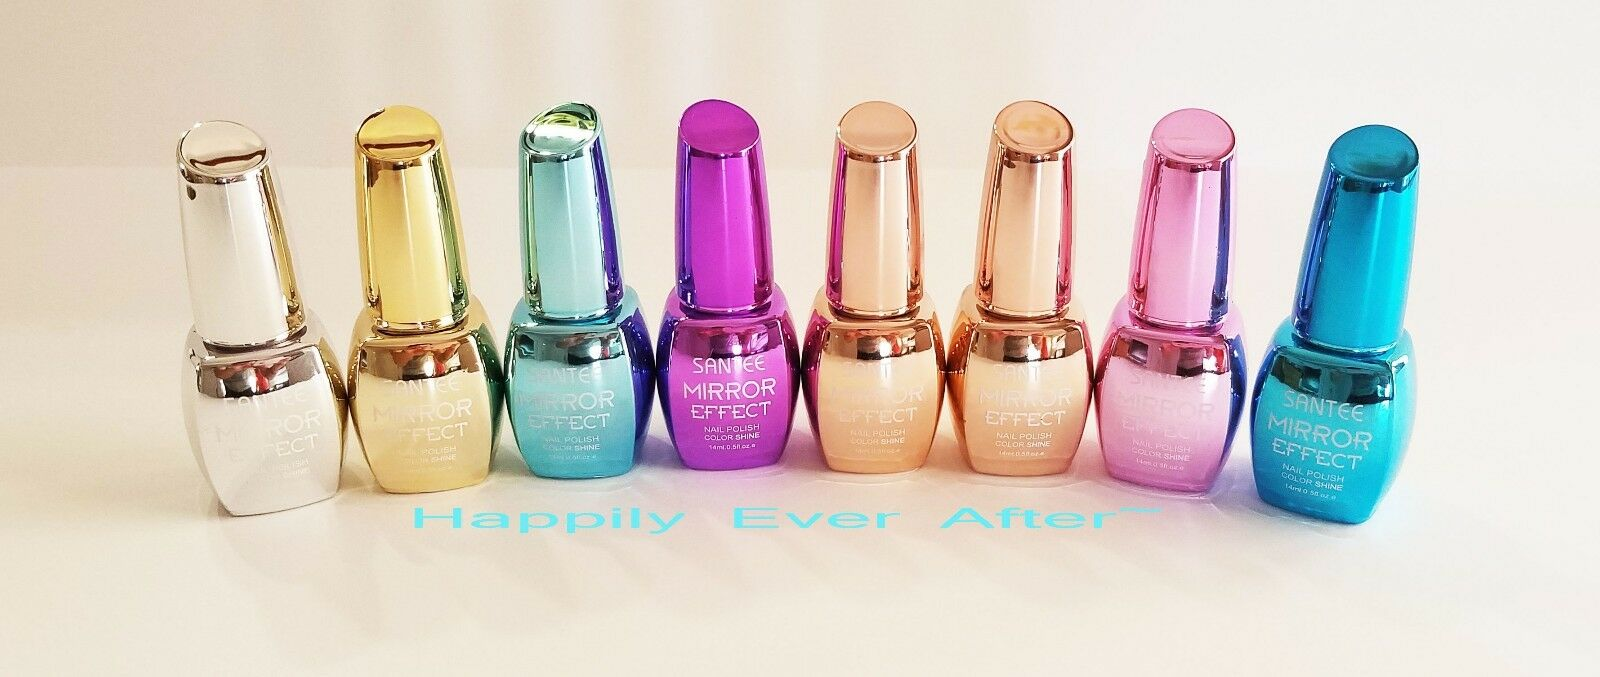 Extra Shine Metallic Mirror Effect Nail Polish Santee - All 8 Colors ...